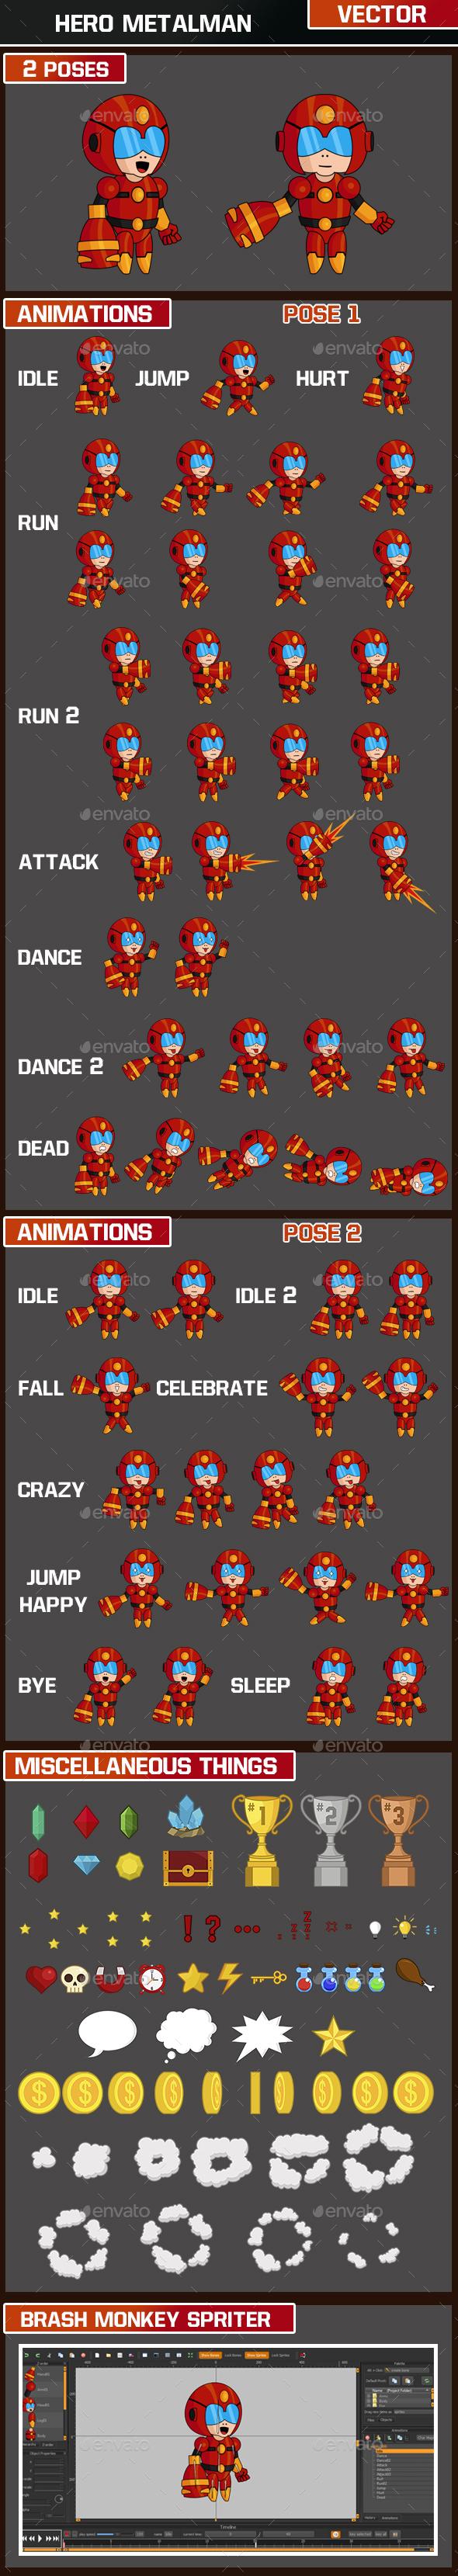 Hero Metalman Character